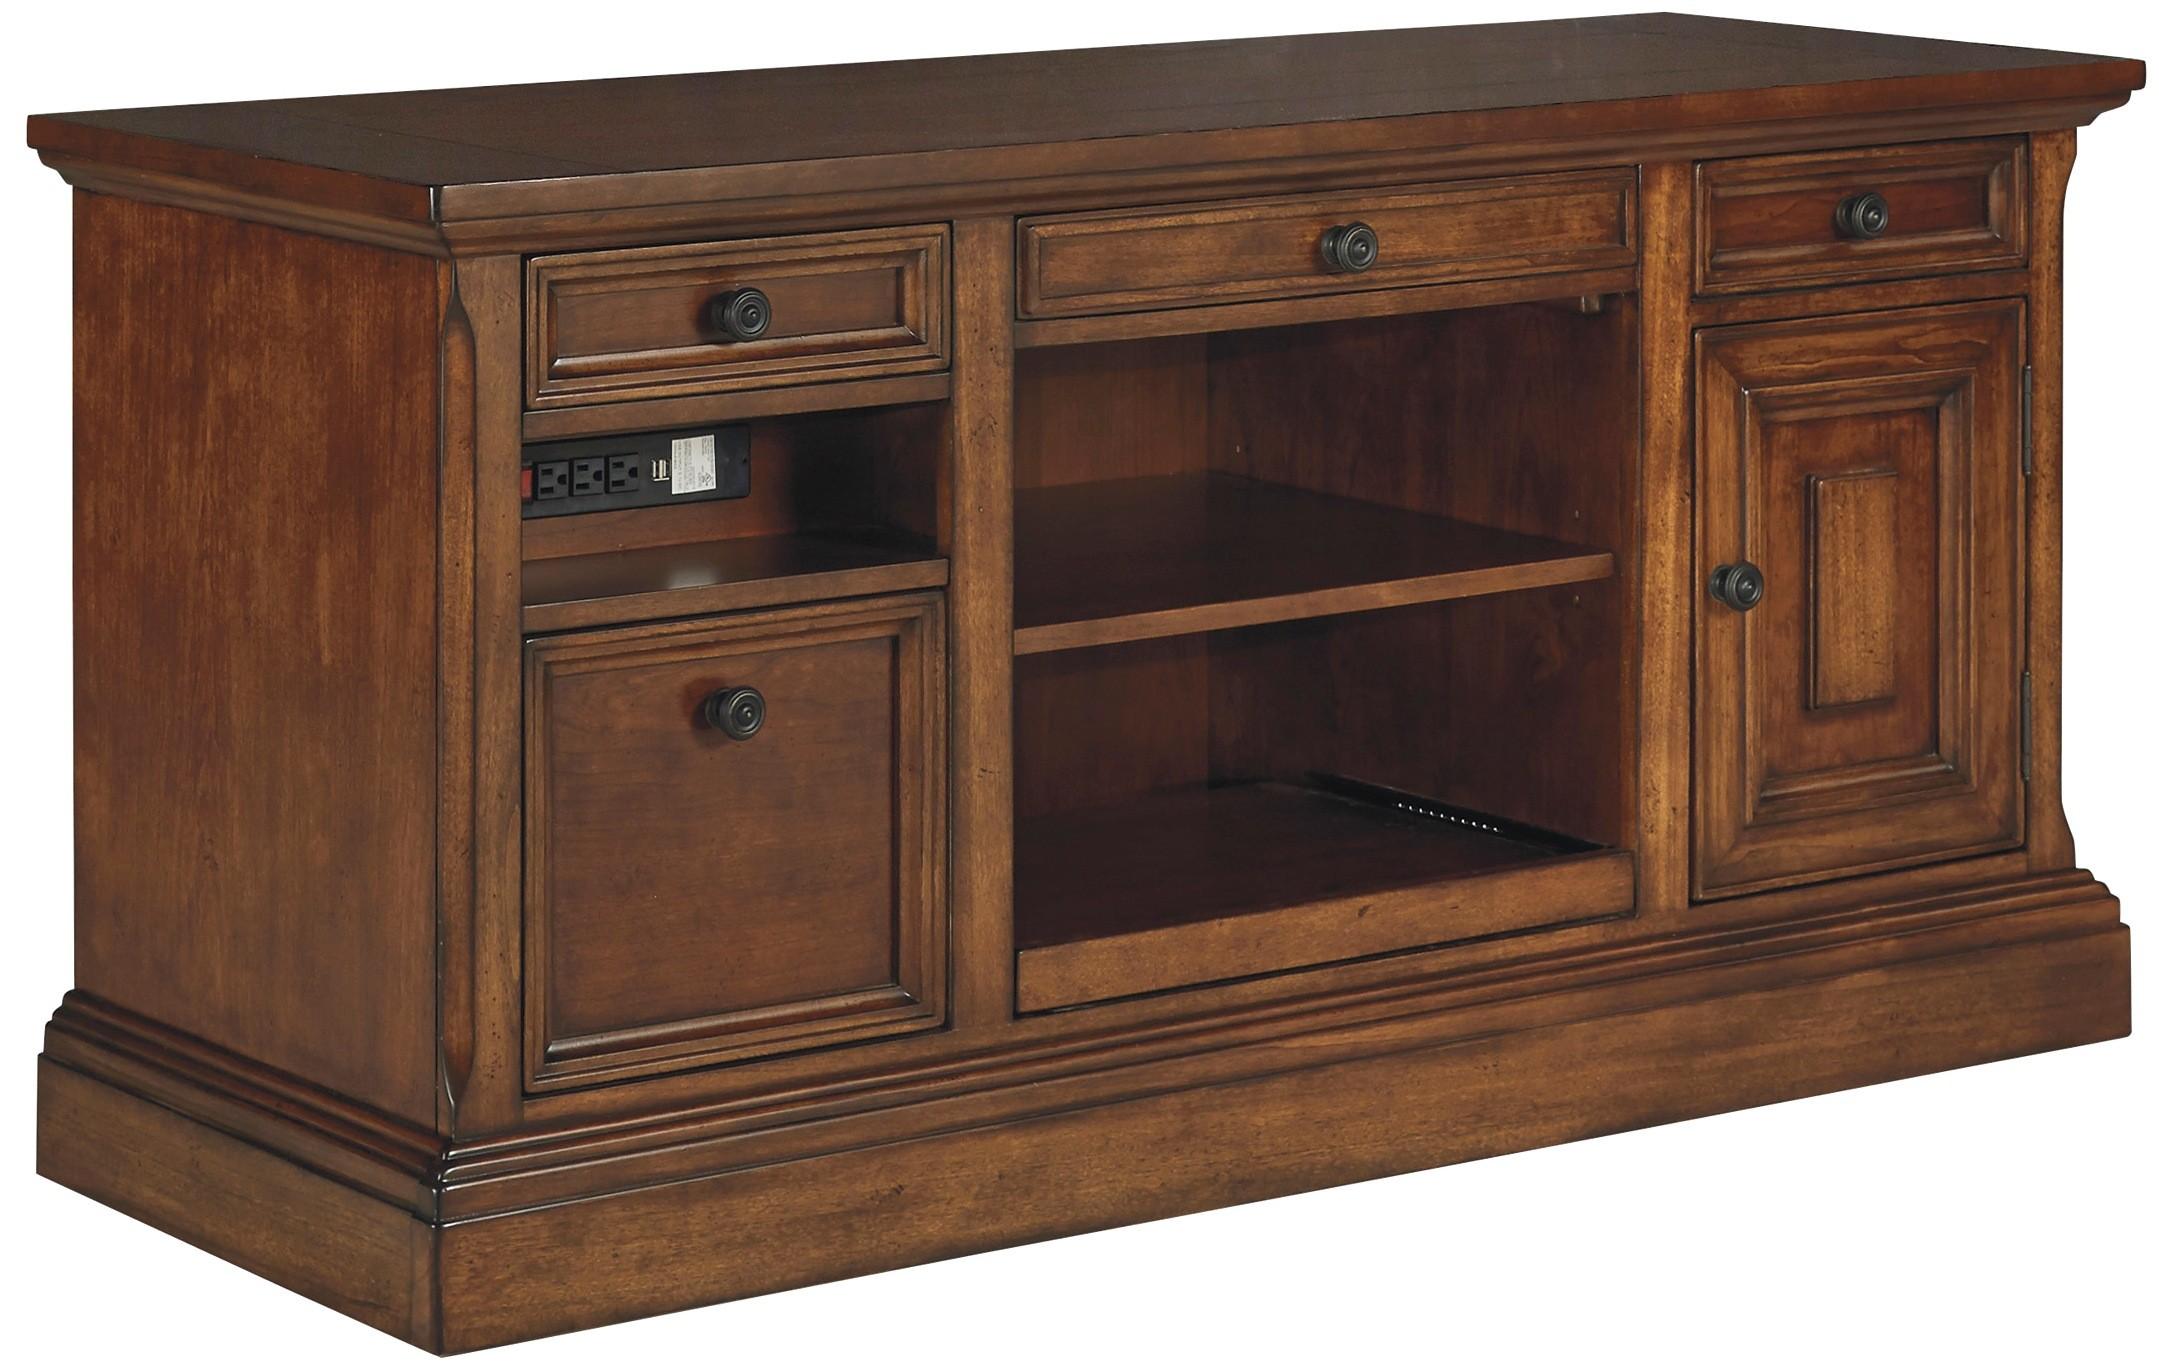 Gaylon Large Credenza H704 46 Ashley Furniture